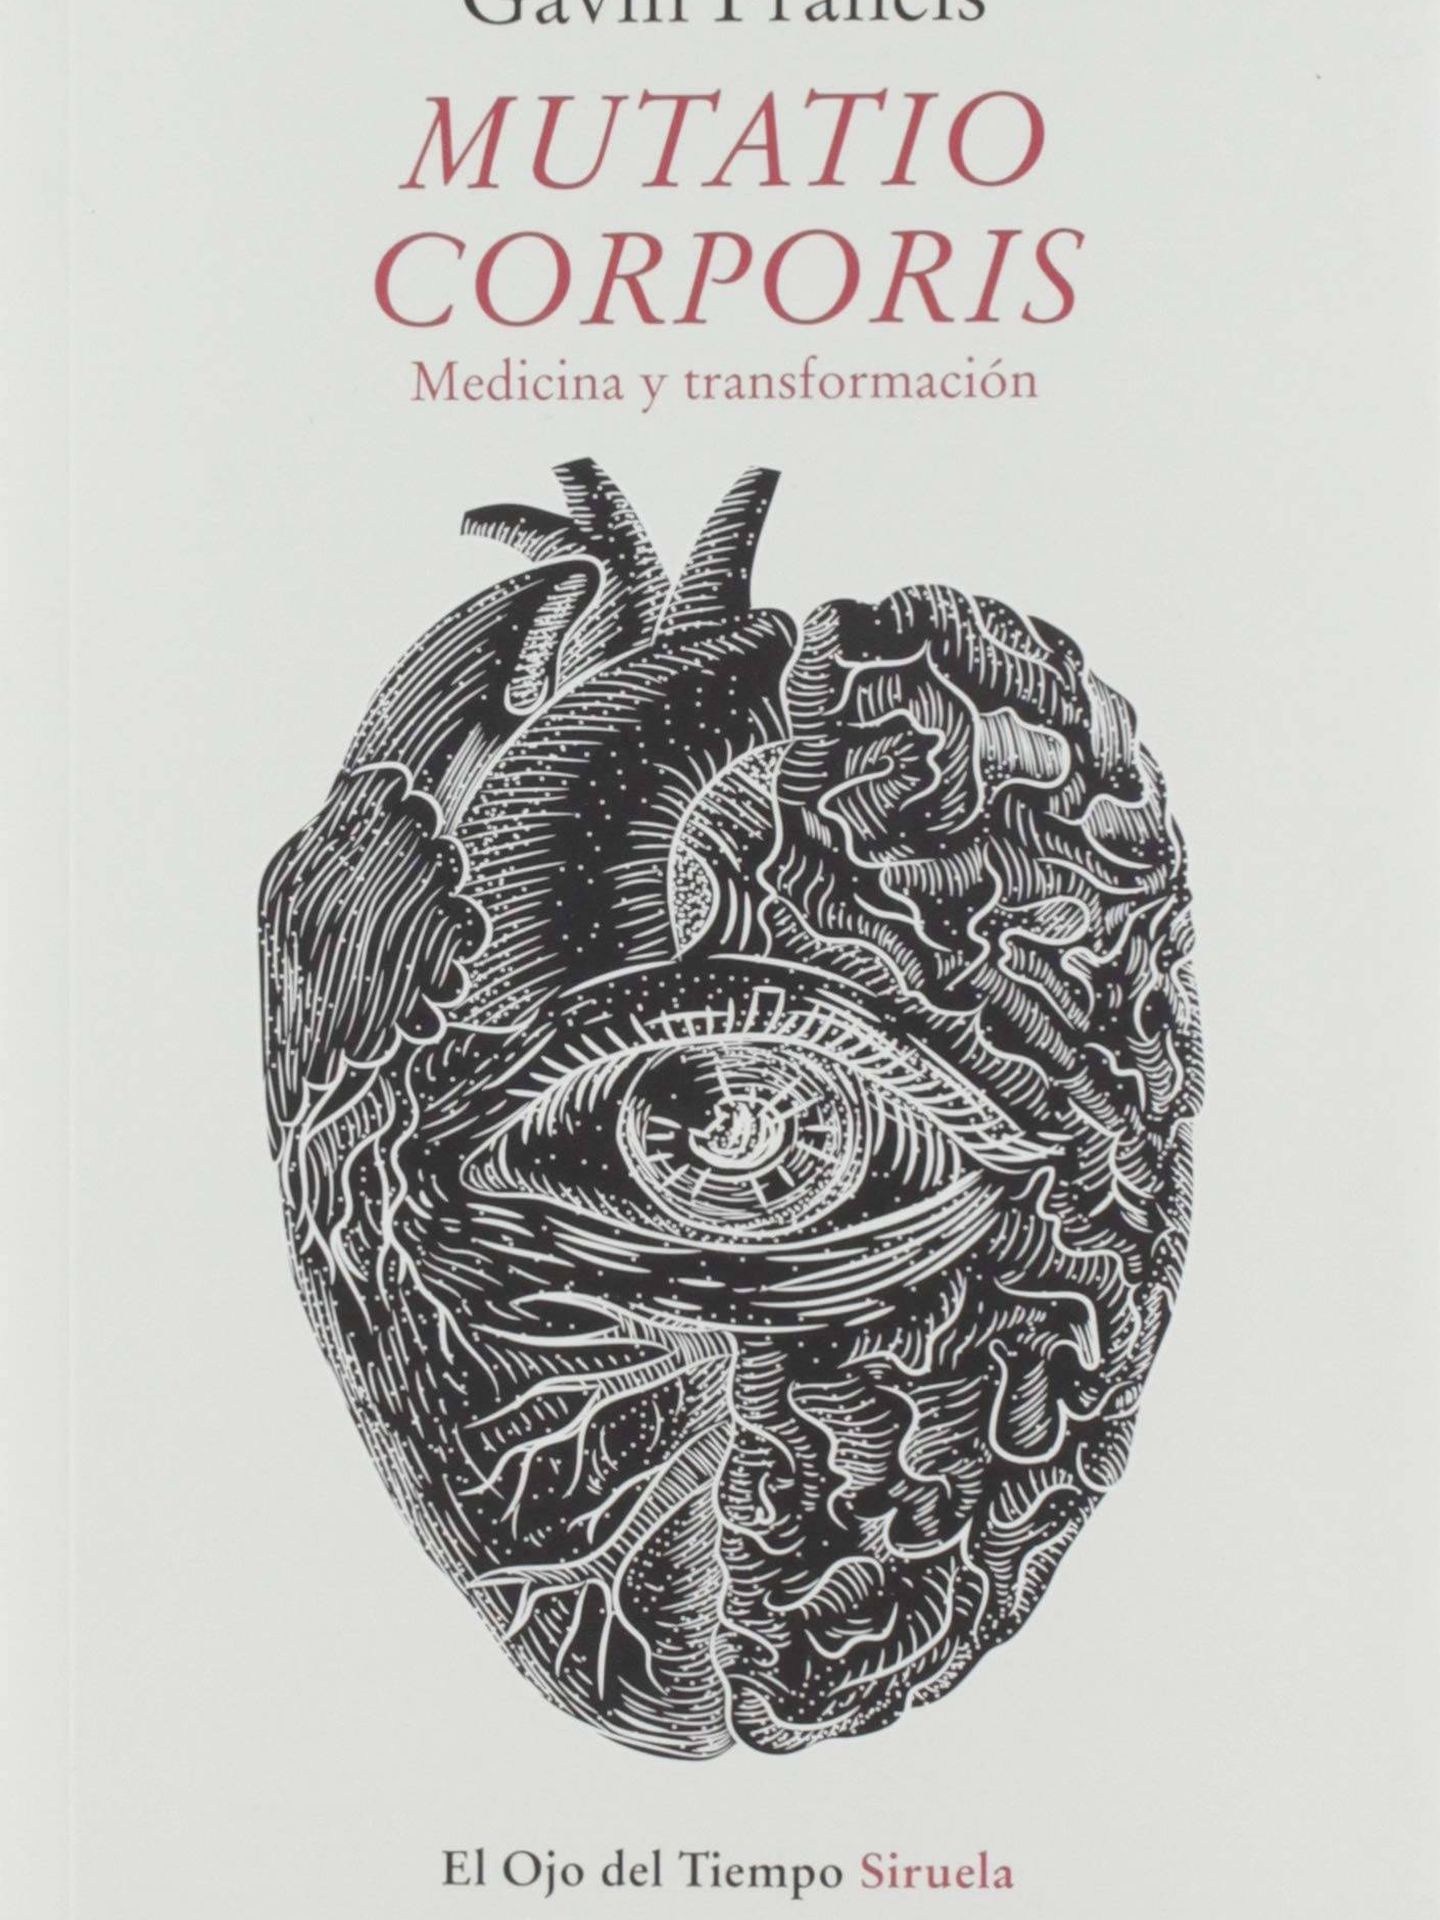 'Mutatio corporis'.